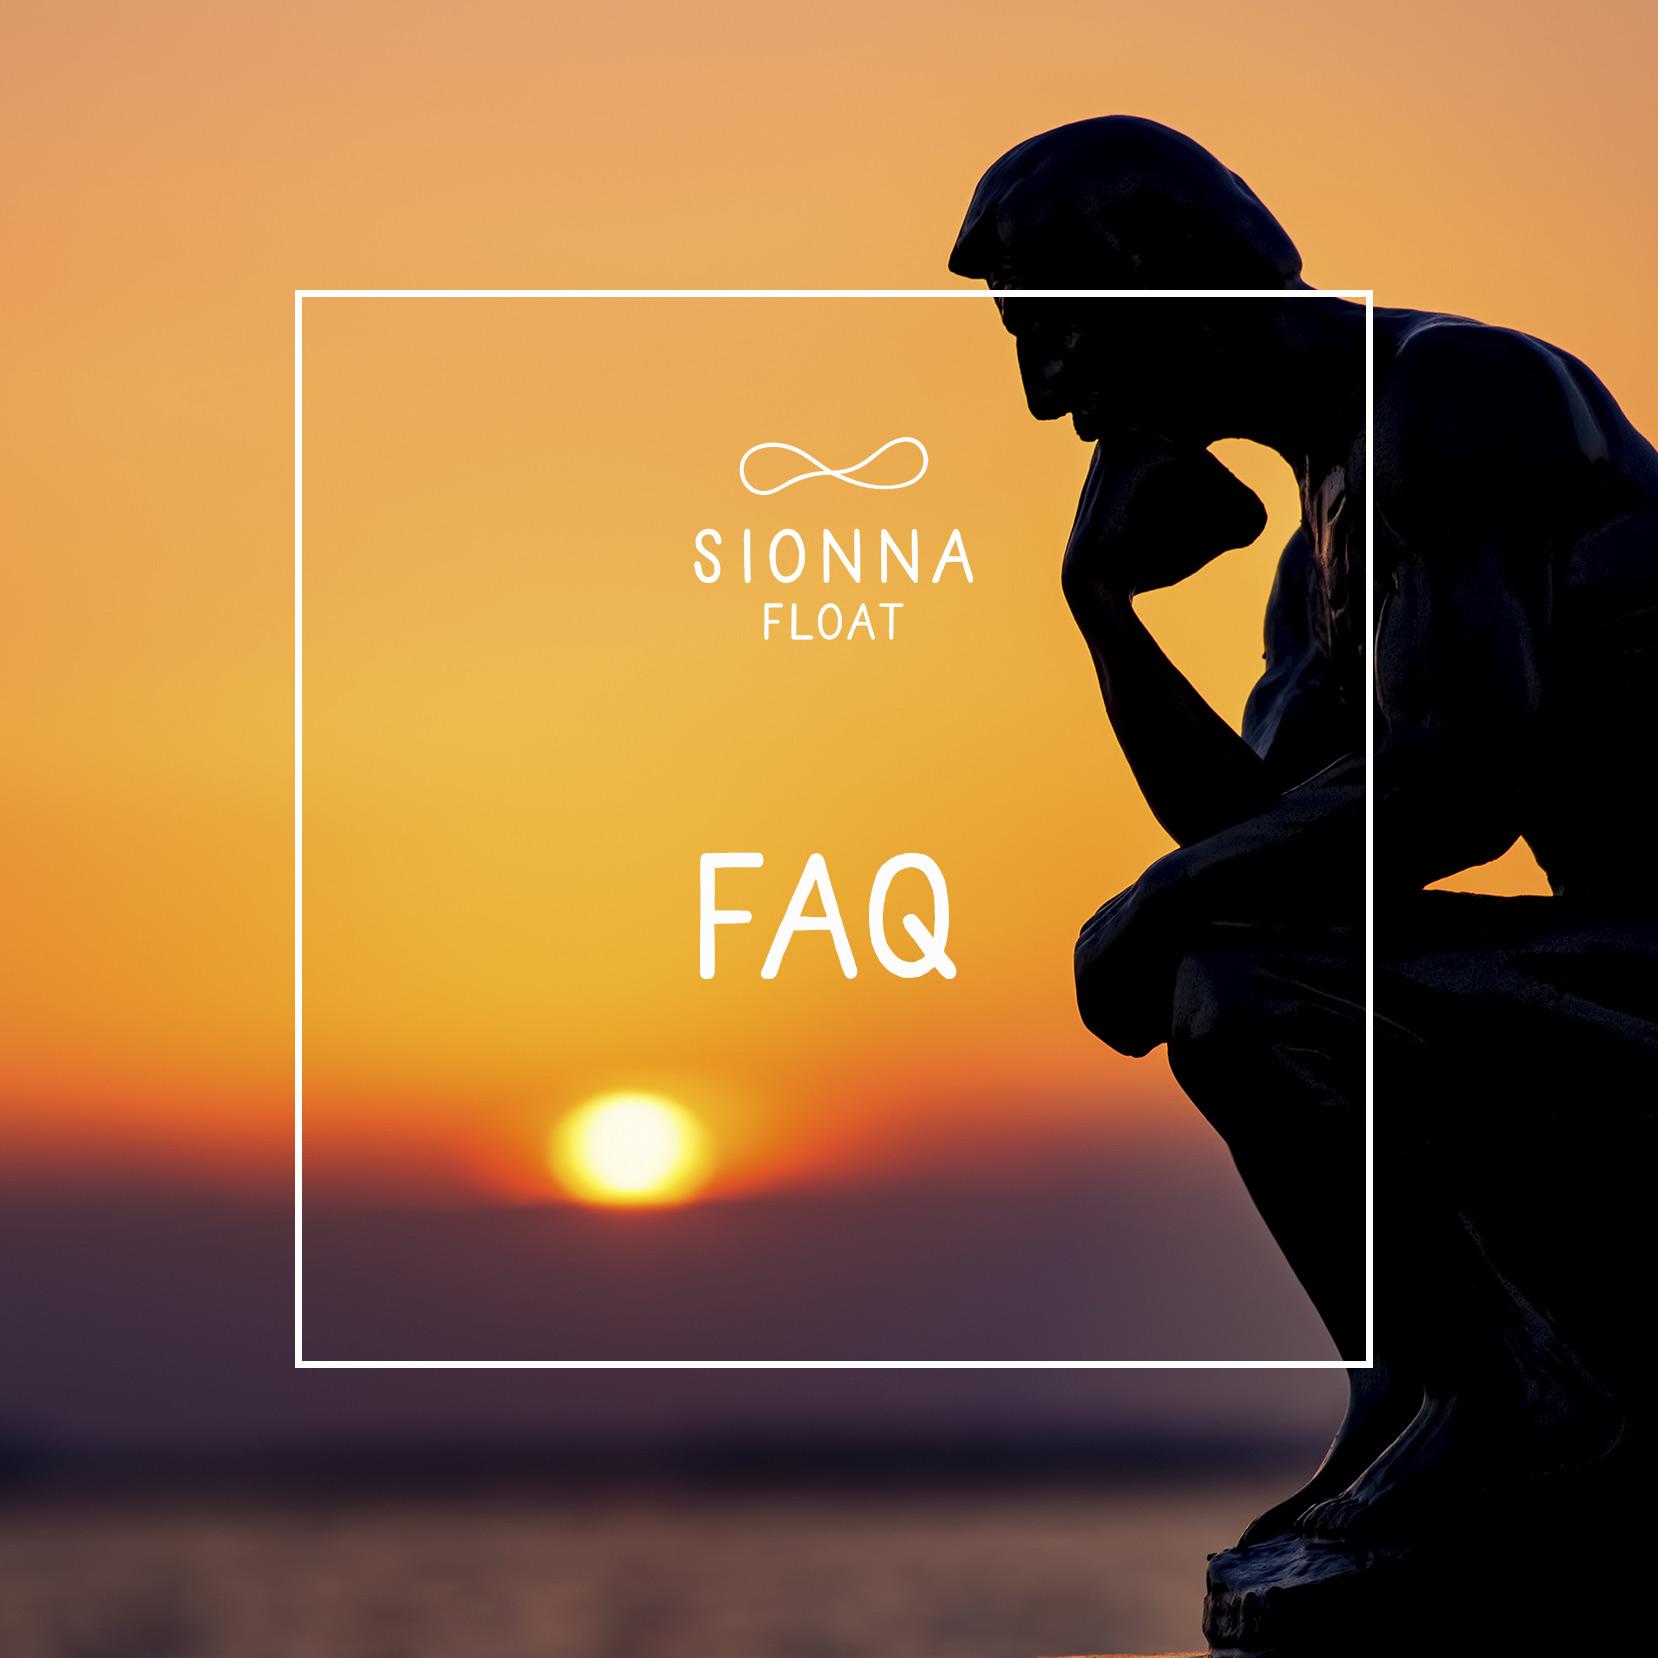 Float_SquareMenuItems_FAQ.jpg